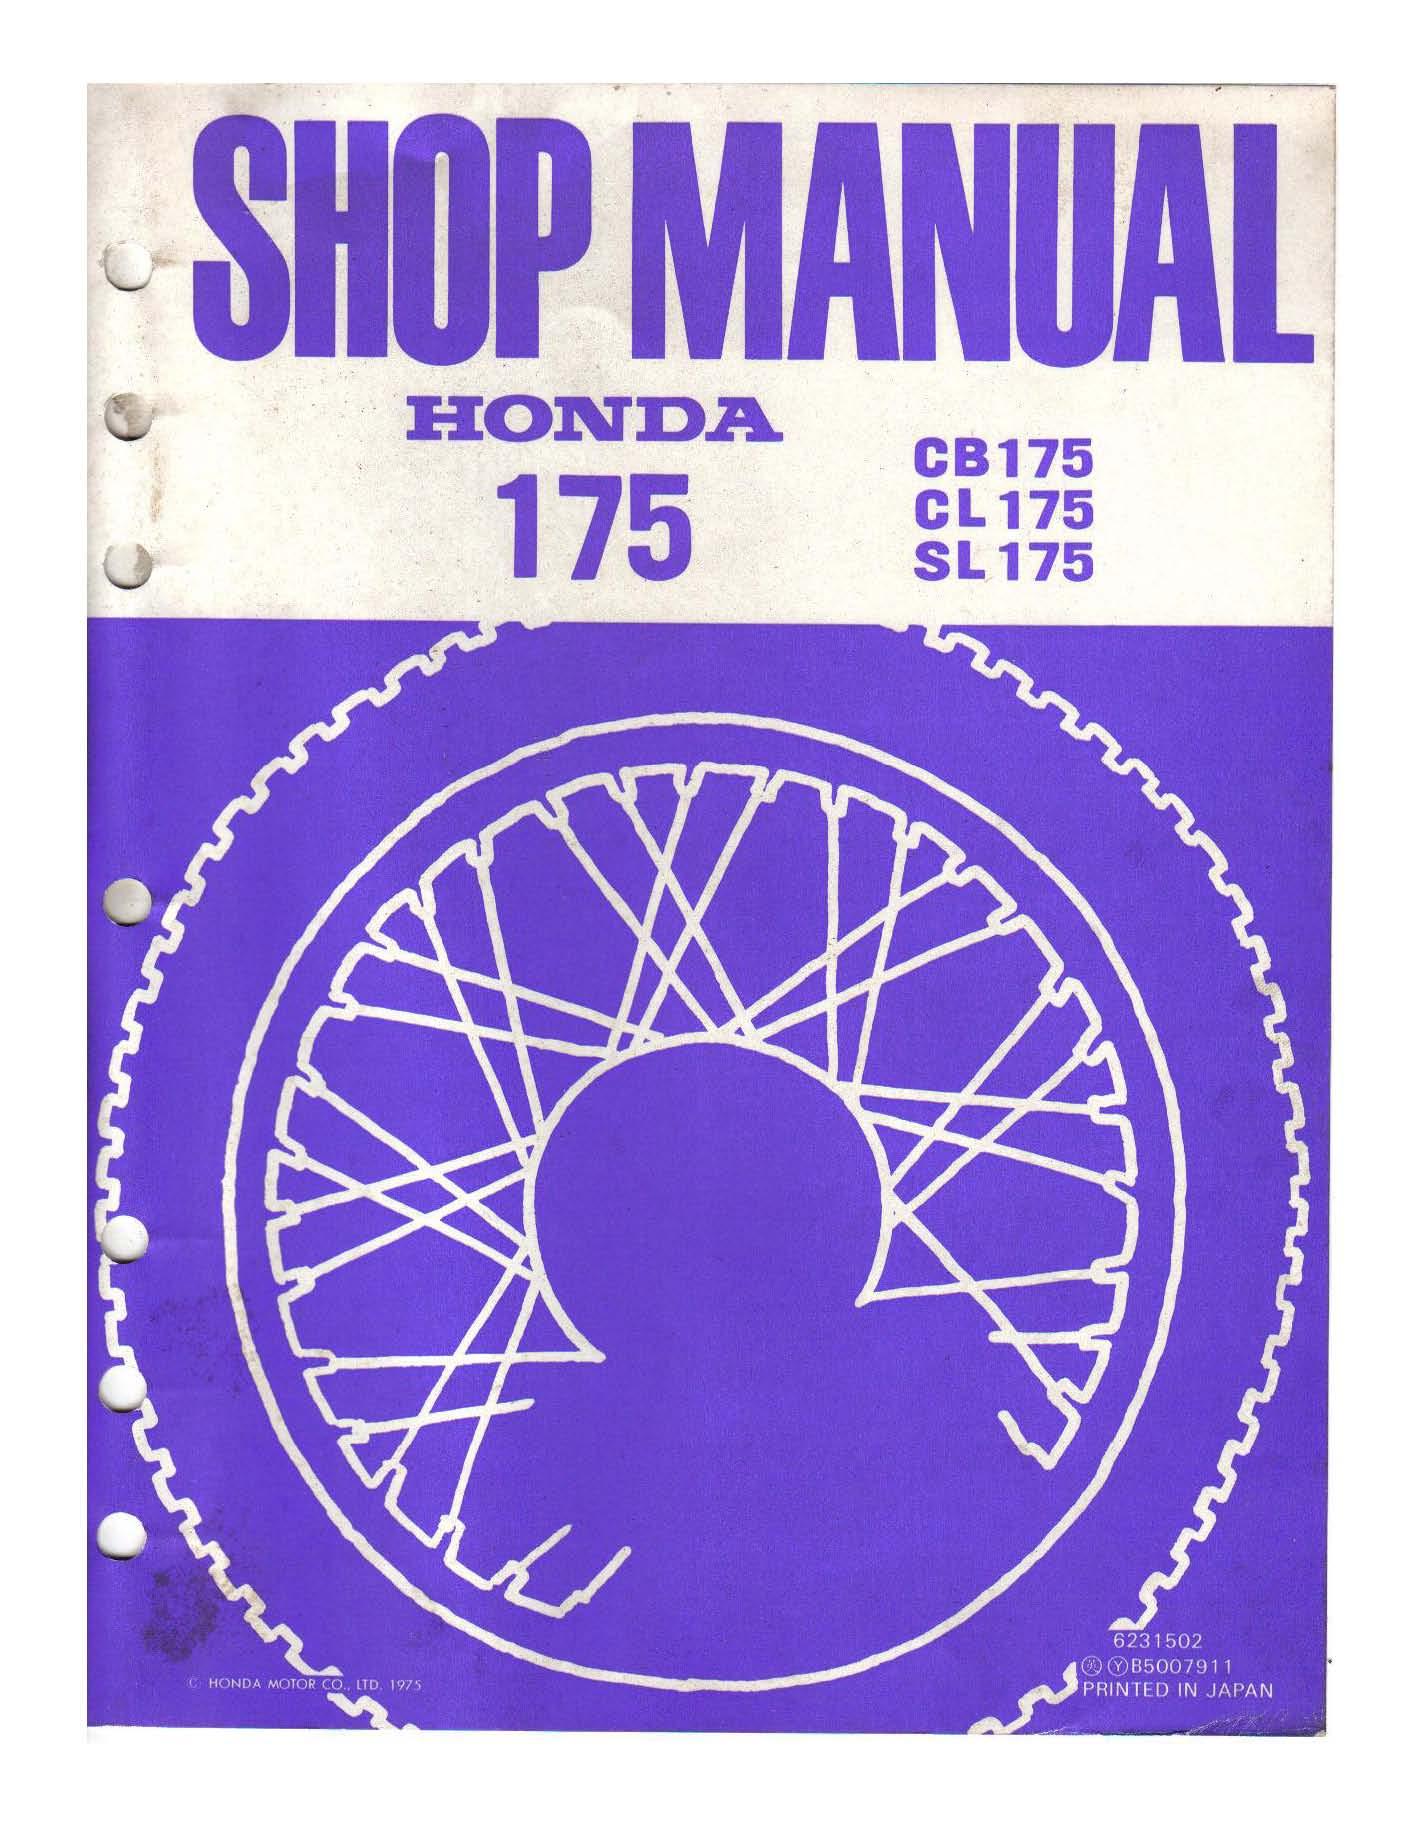 Workshop manual for Honda CB175 (1975)